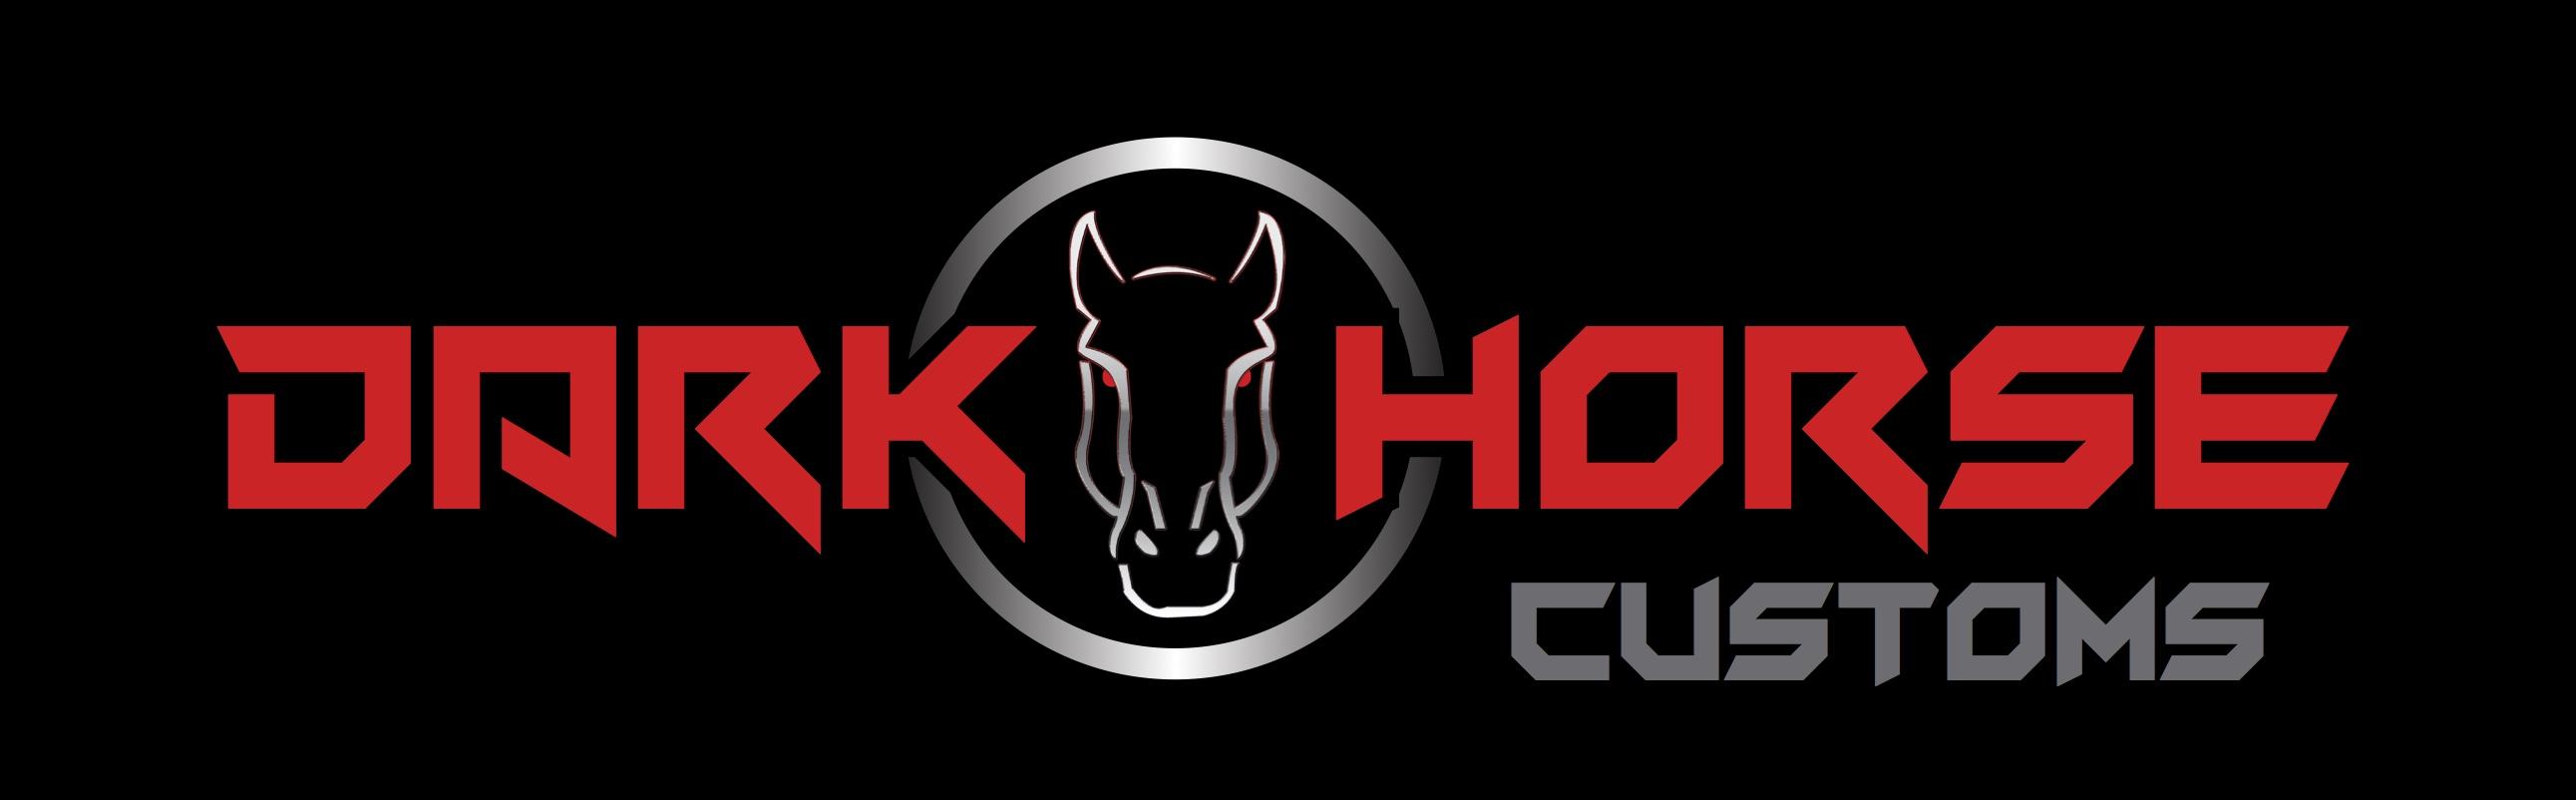 Carousel Logo 5